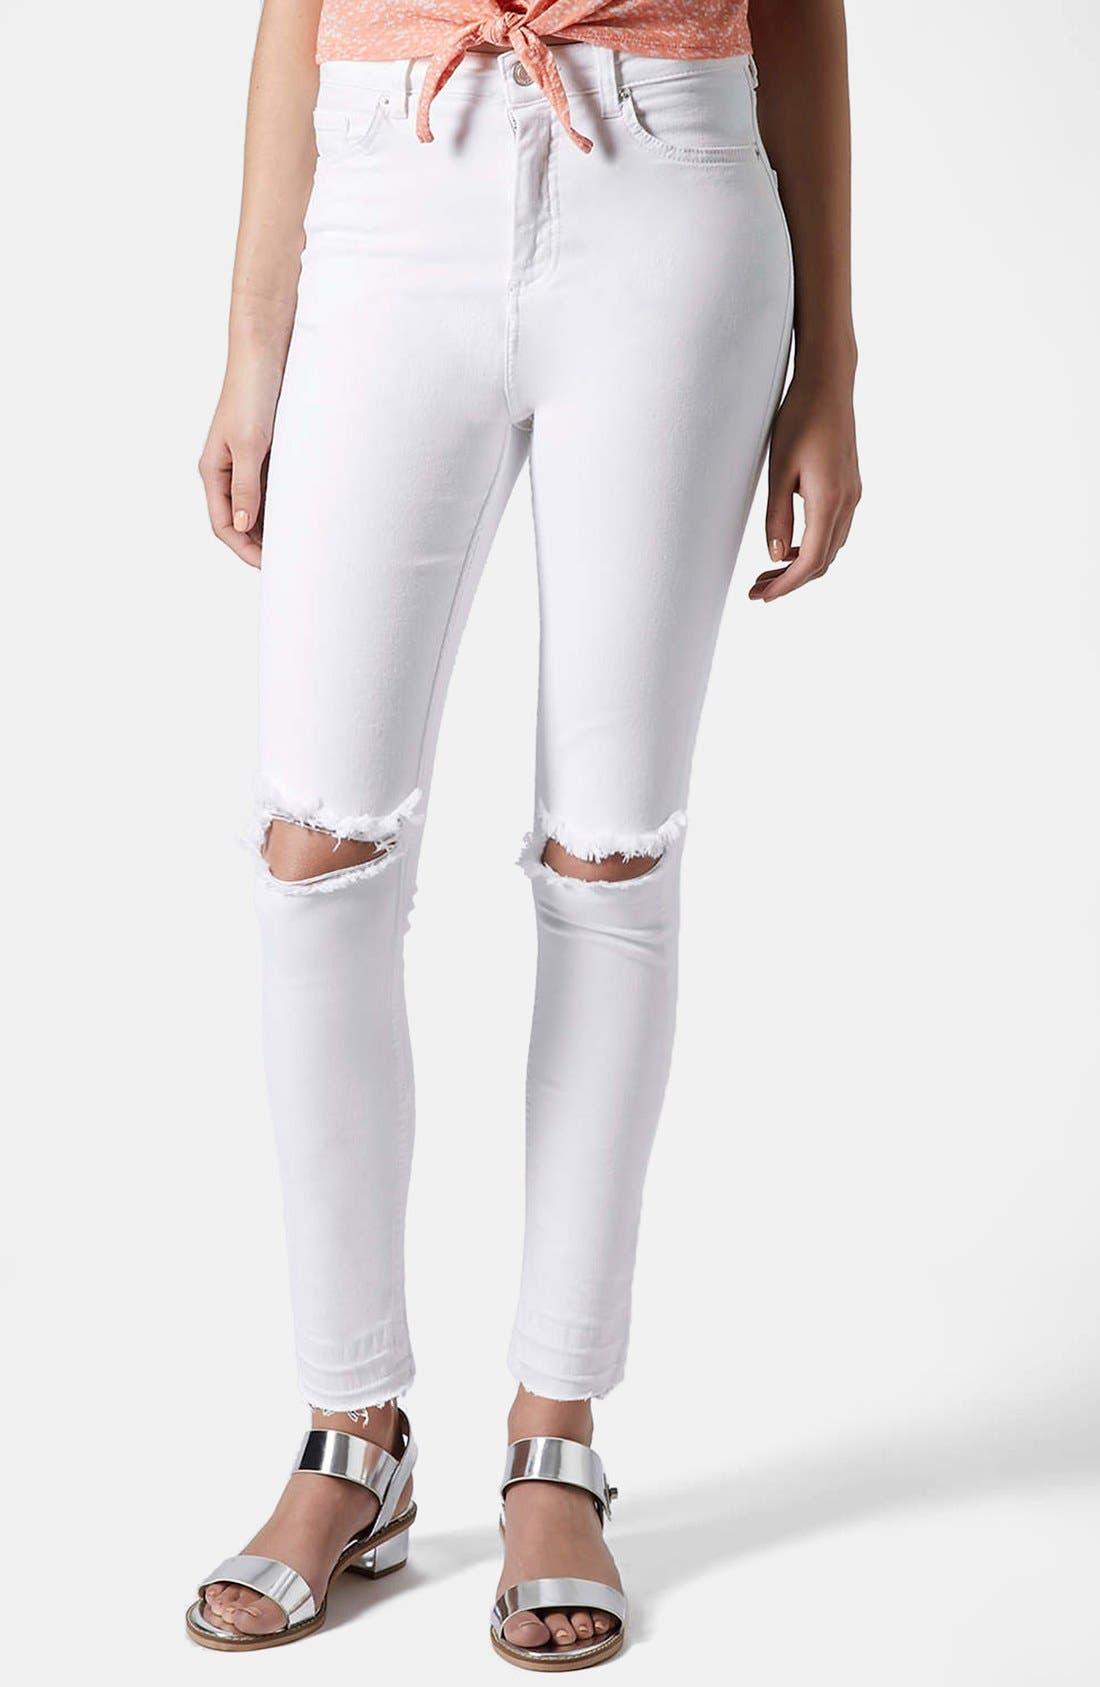 Alternate Image 1 Selected - Topshop Moto 'Jamie' Ripped High Rise Ankle Skinny Jeans (White) (Regular & Short)